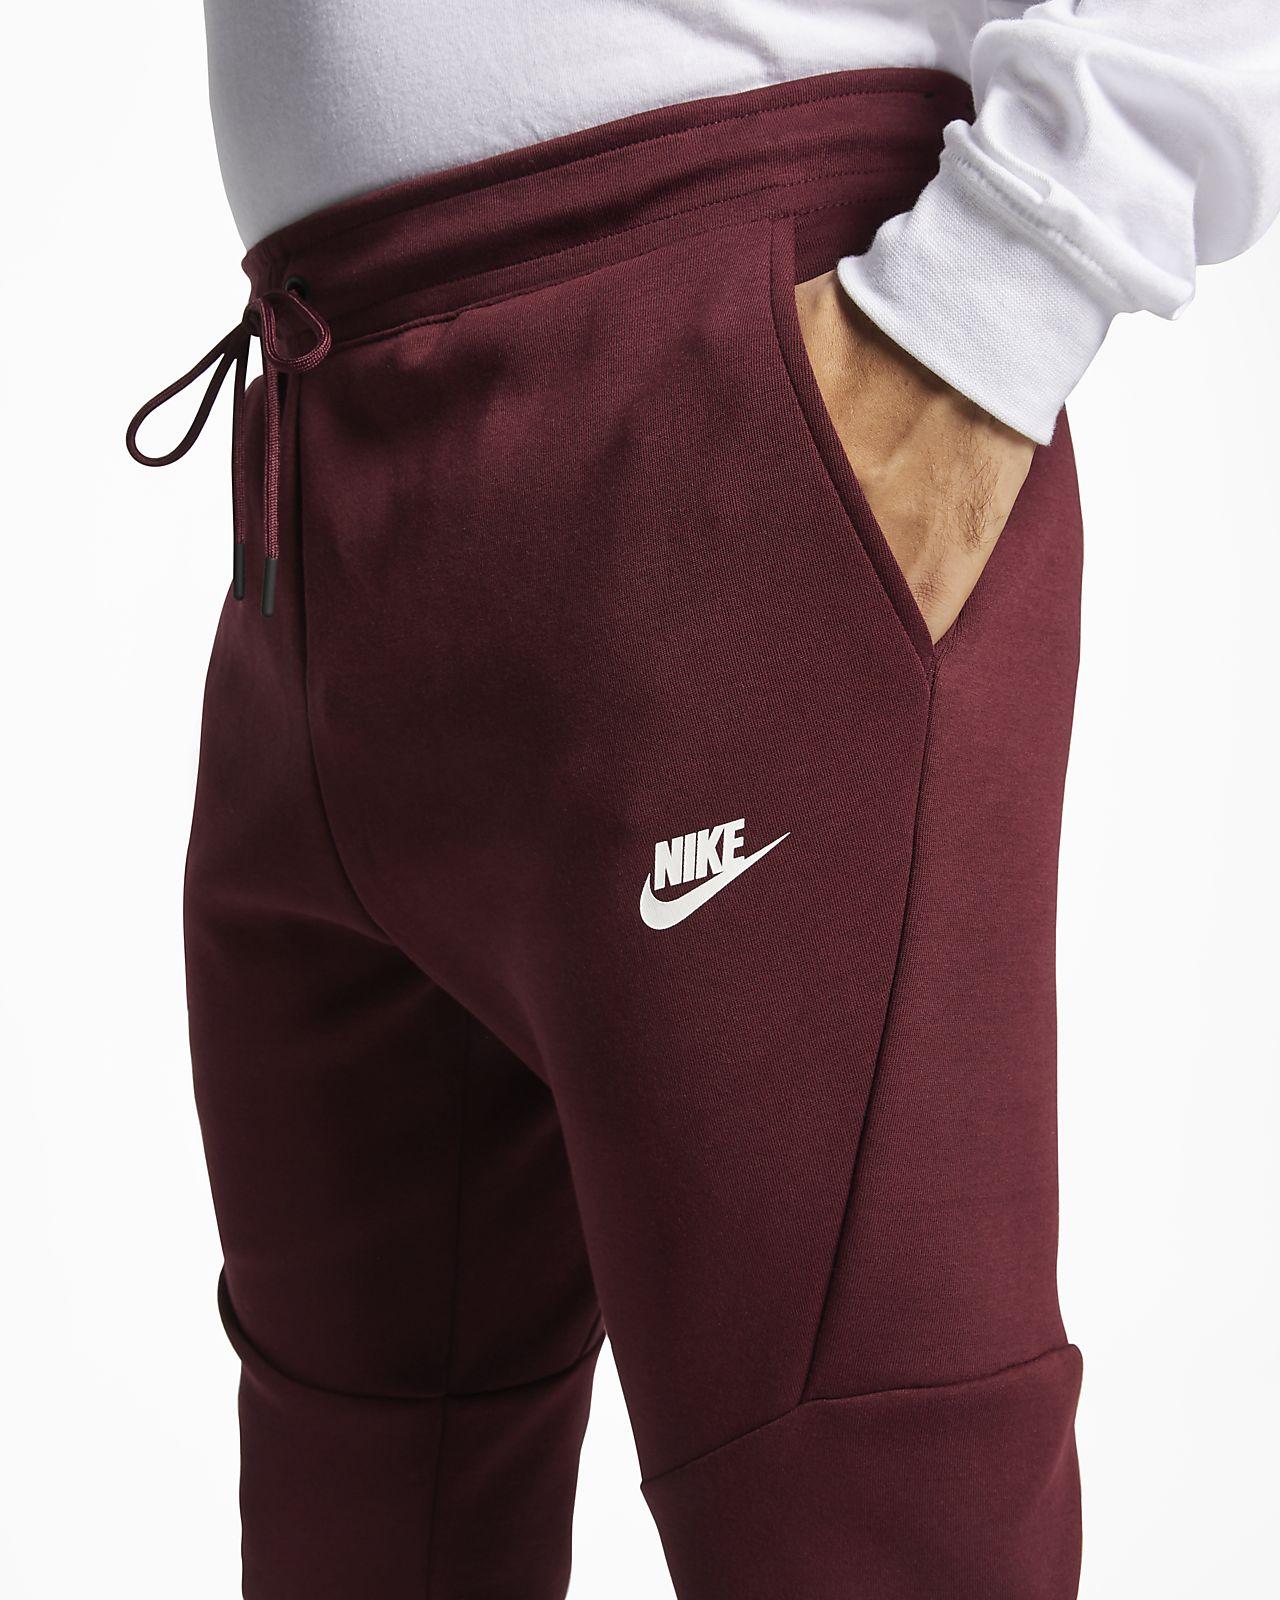 03b2326a9e63 Nike Sportswear Tech Fleece Men s Joggers. Nike.com CA